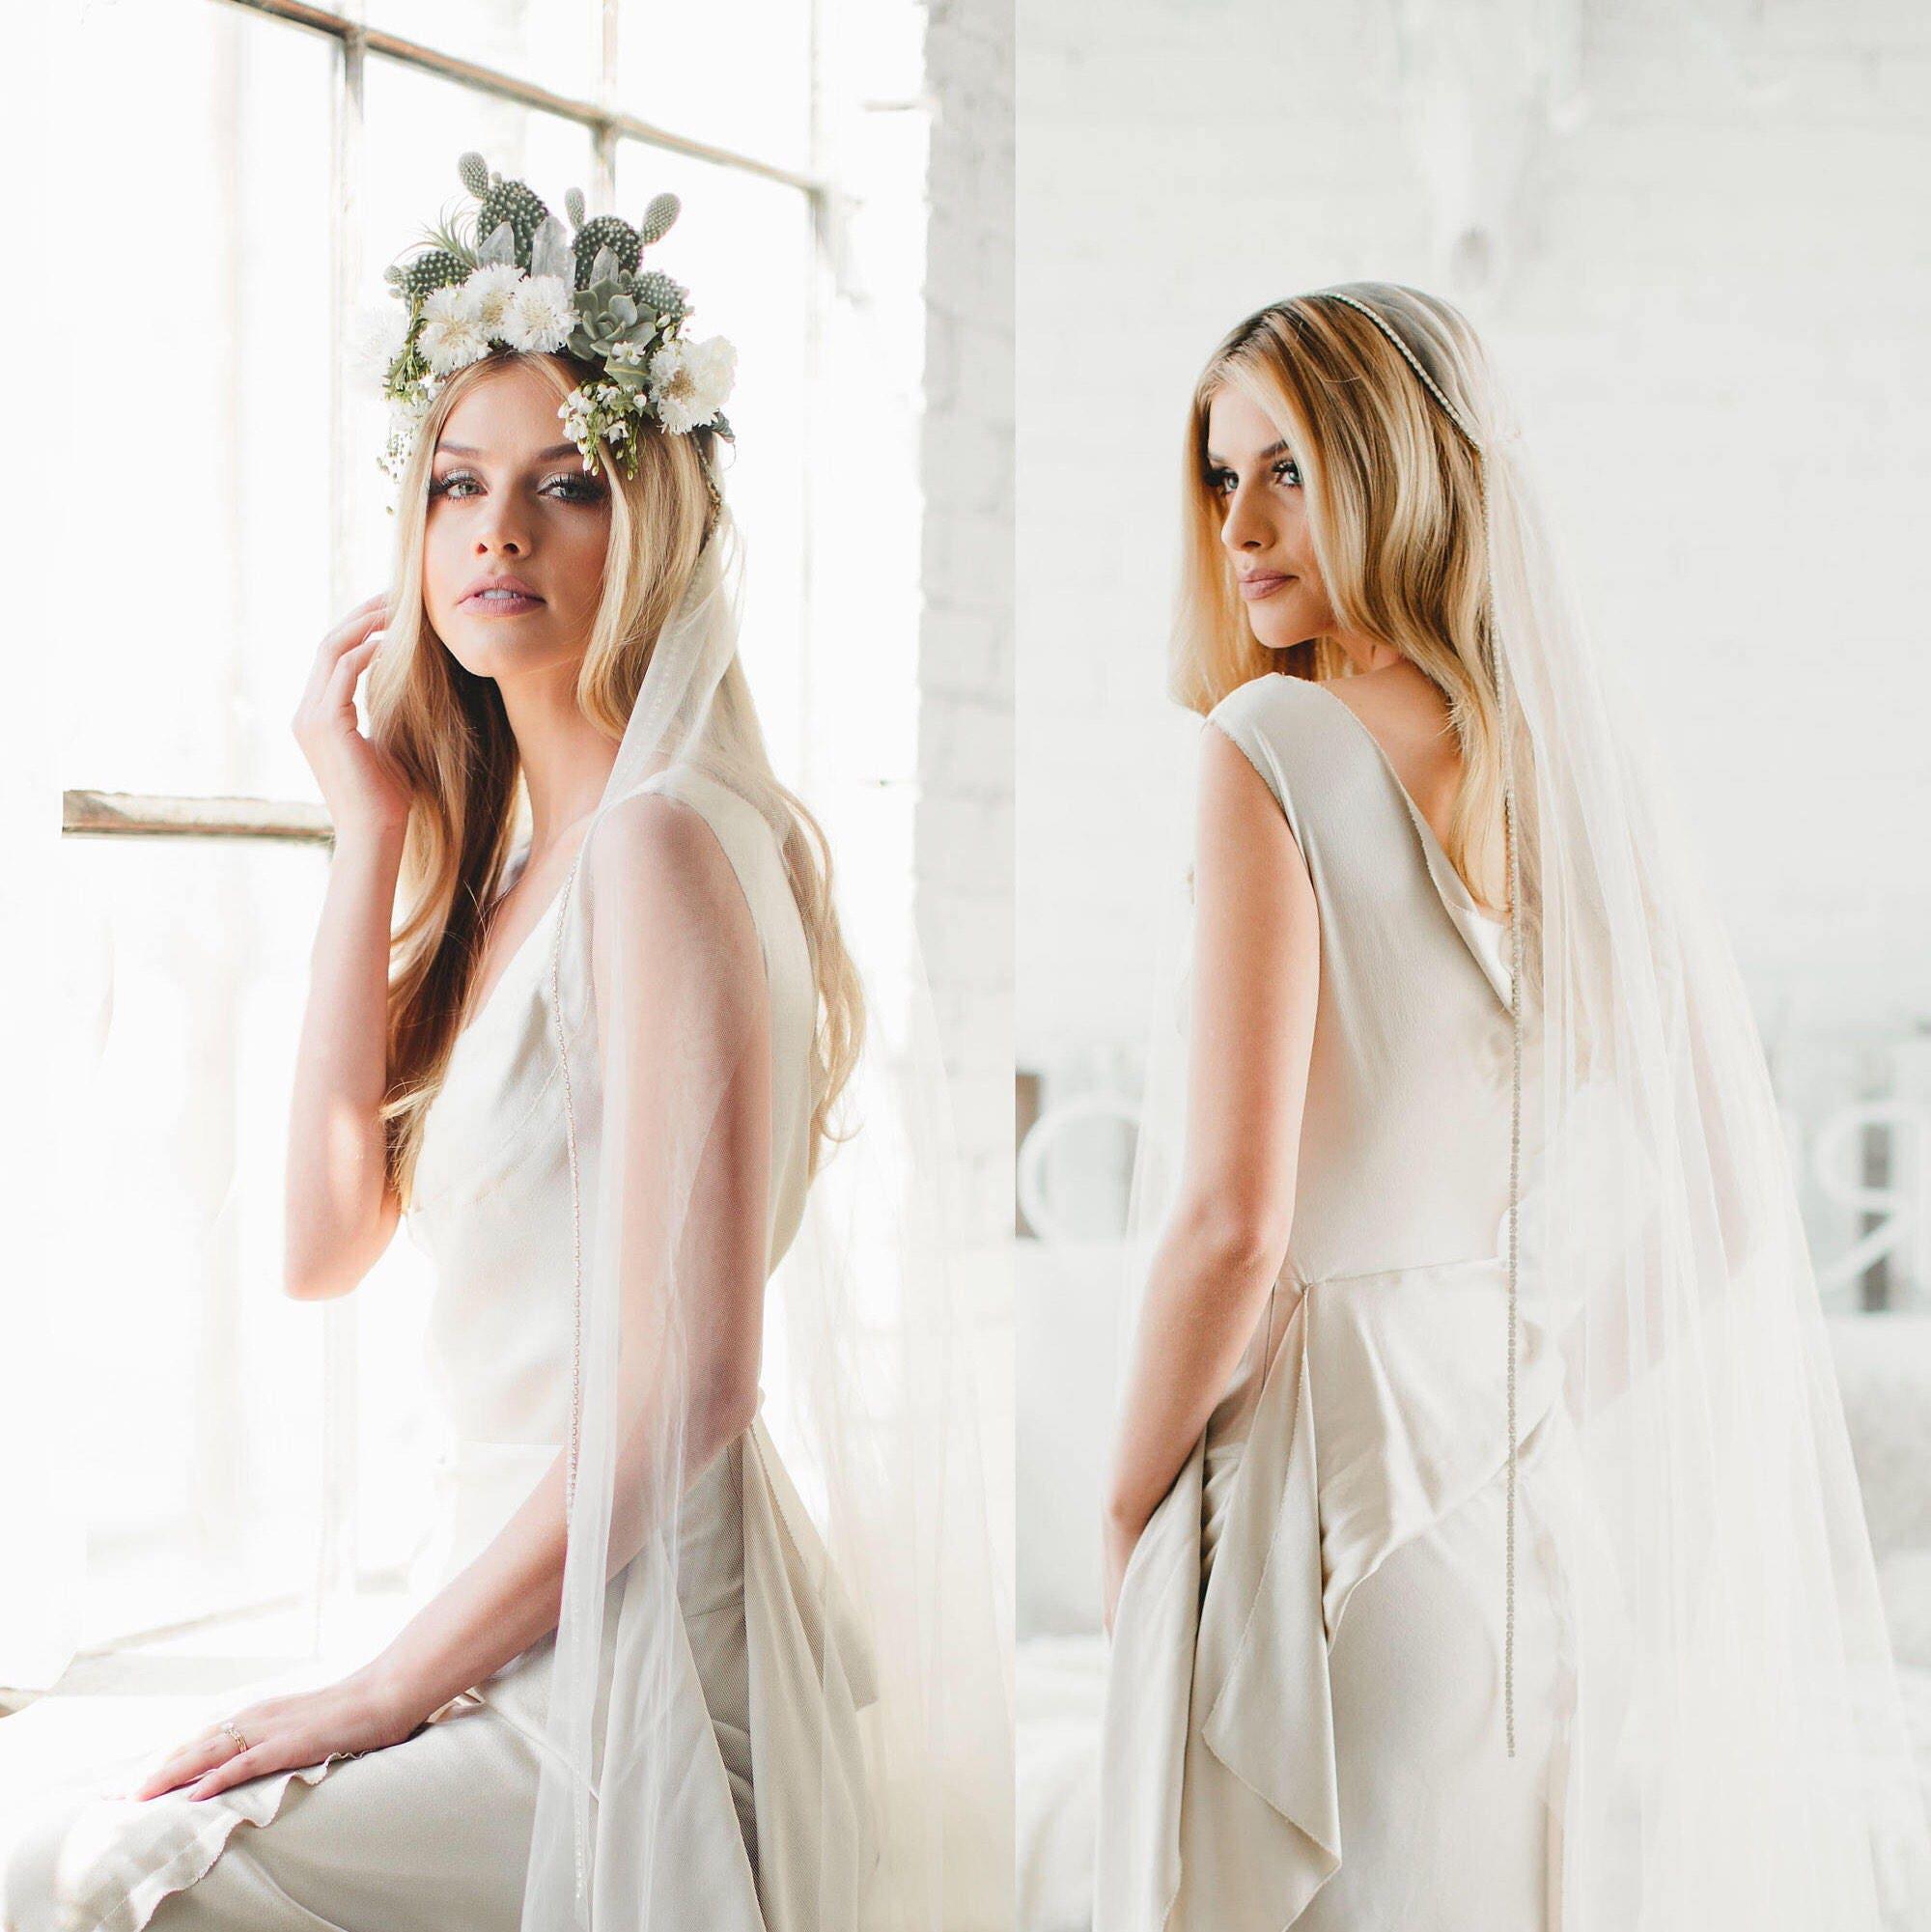 GOLD Crystal Juliet Cap Veil Wedding Veil Vintage Veil Gold